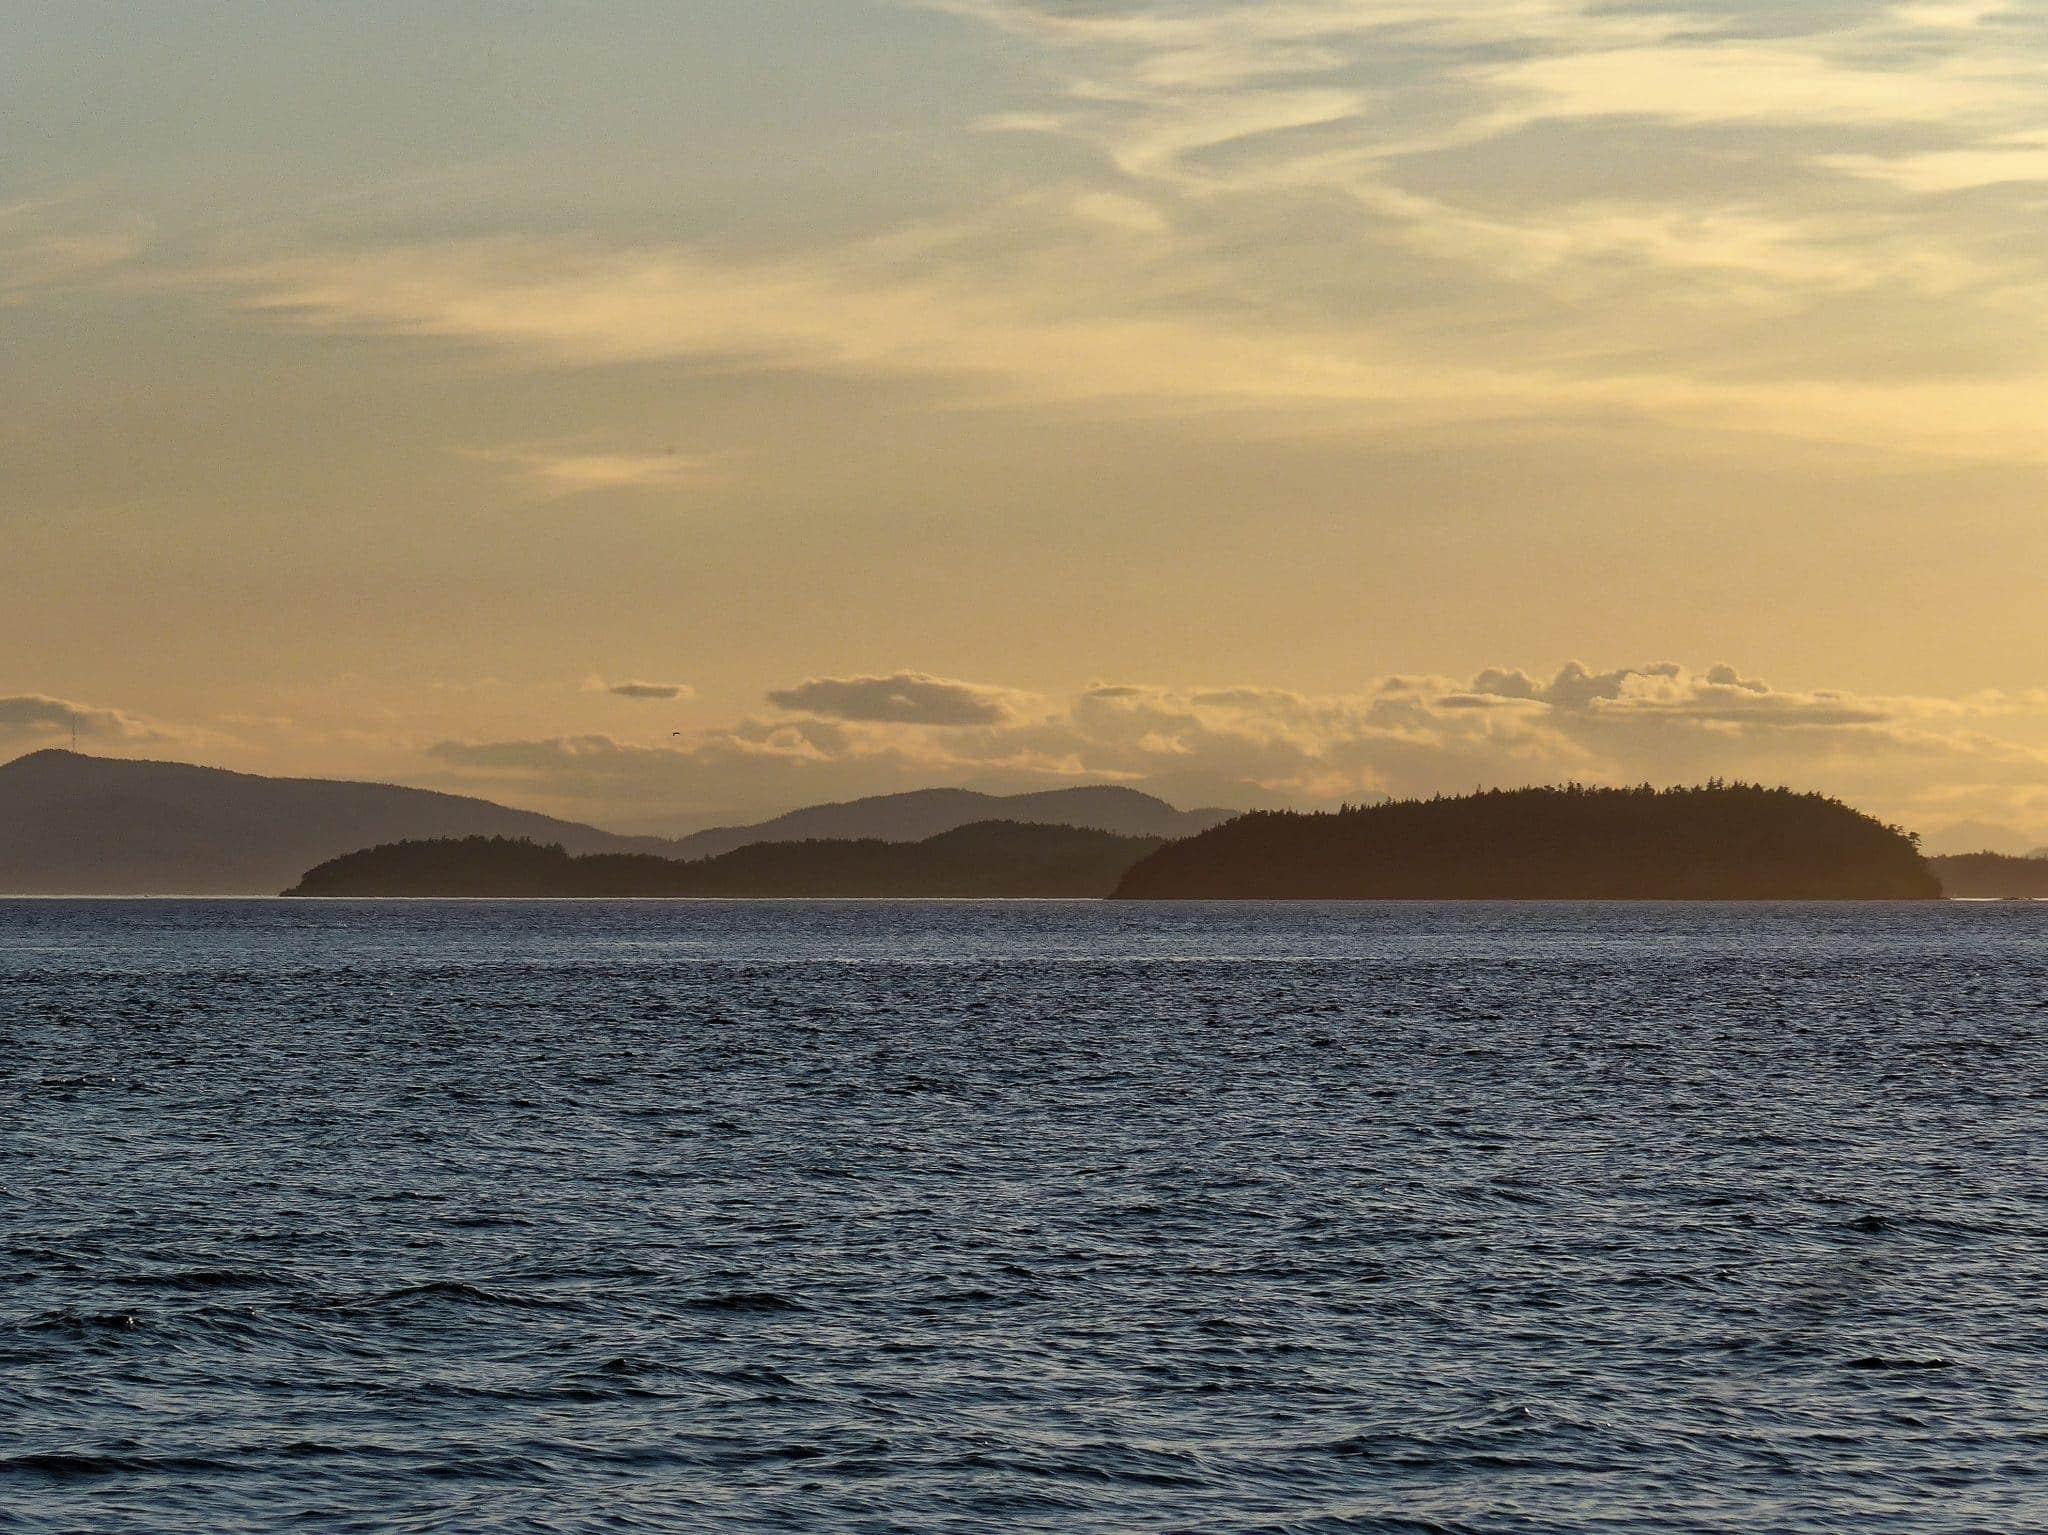 Sucia Island from Lummi Island